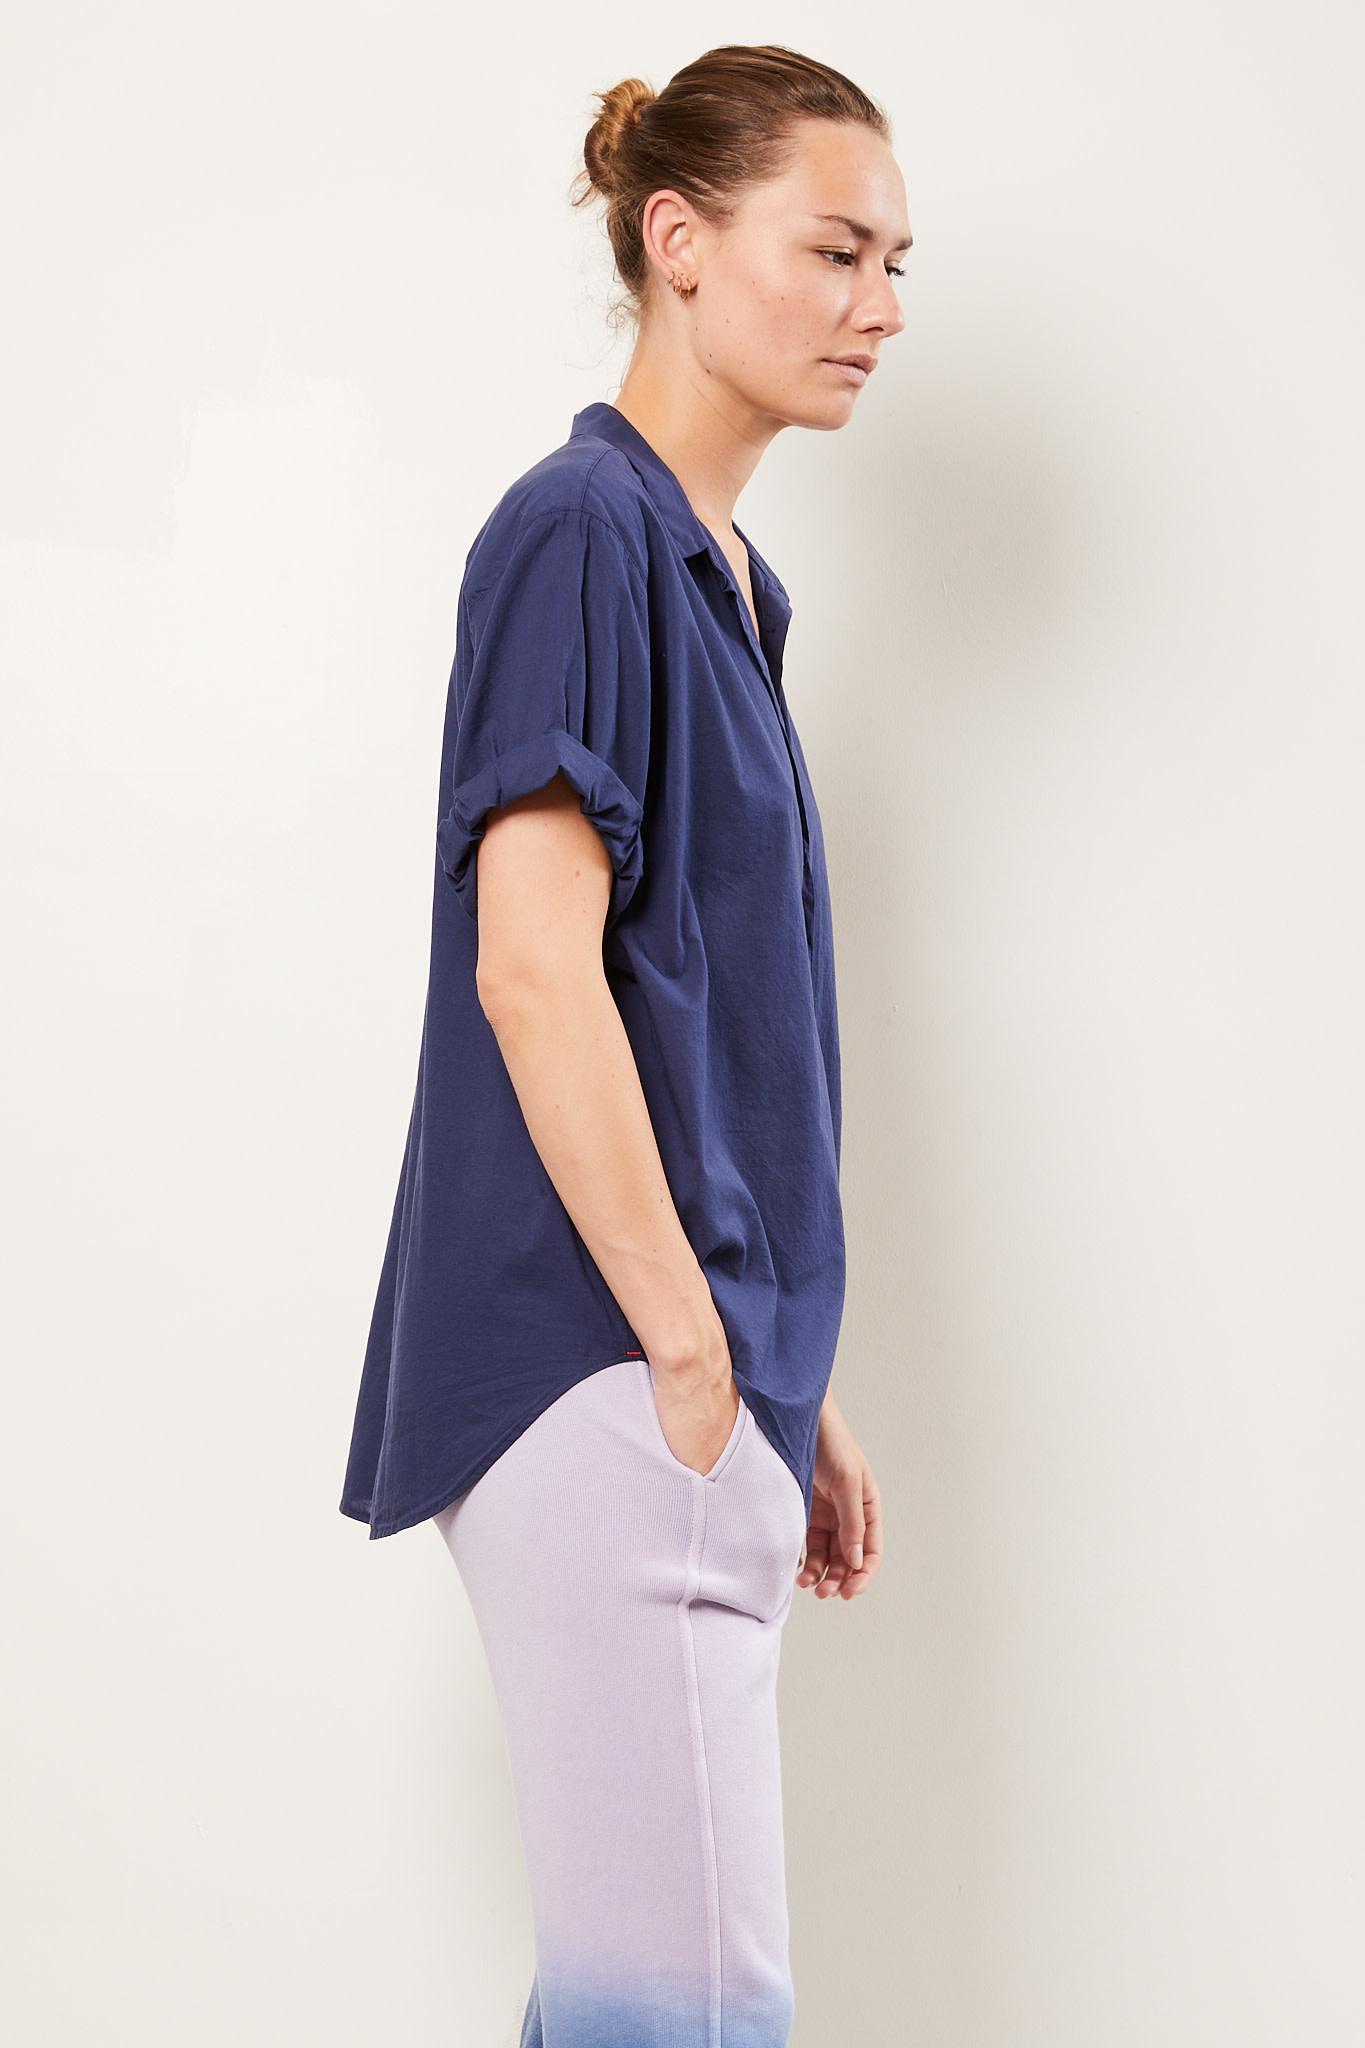 Xirena - Channing cotton poplin shirt